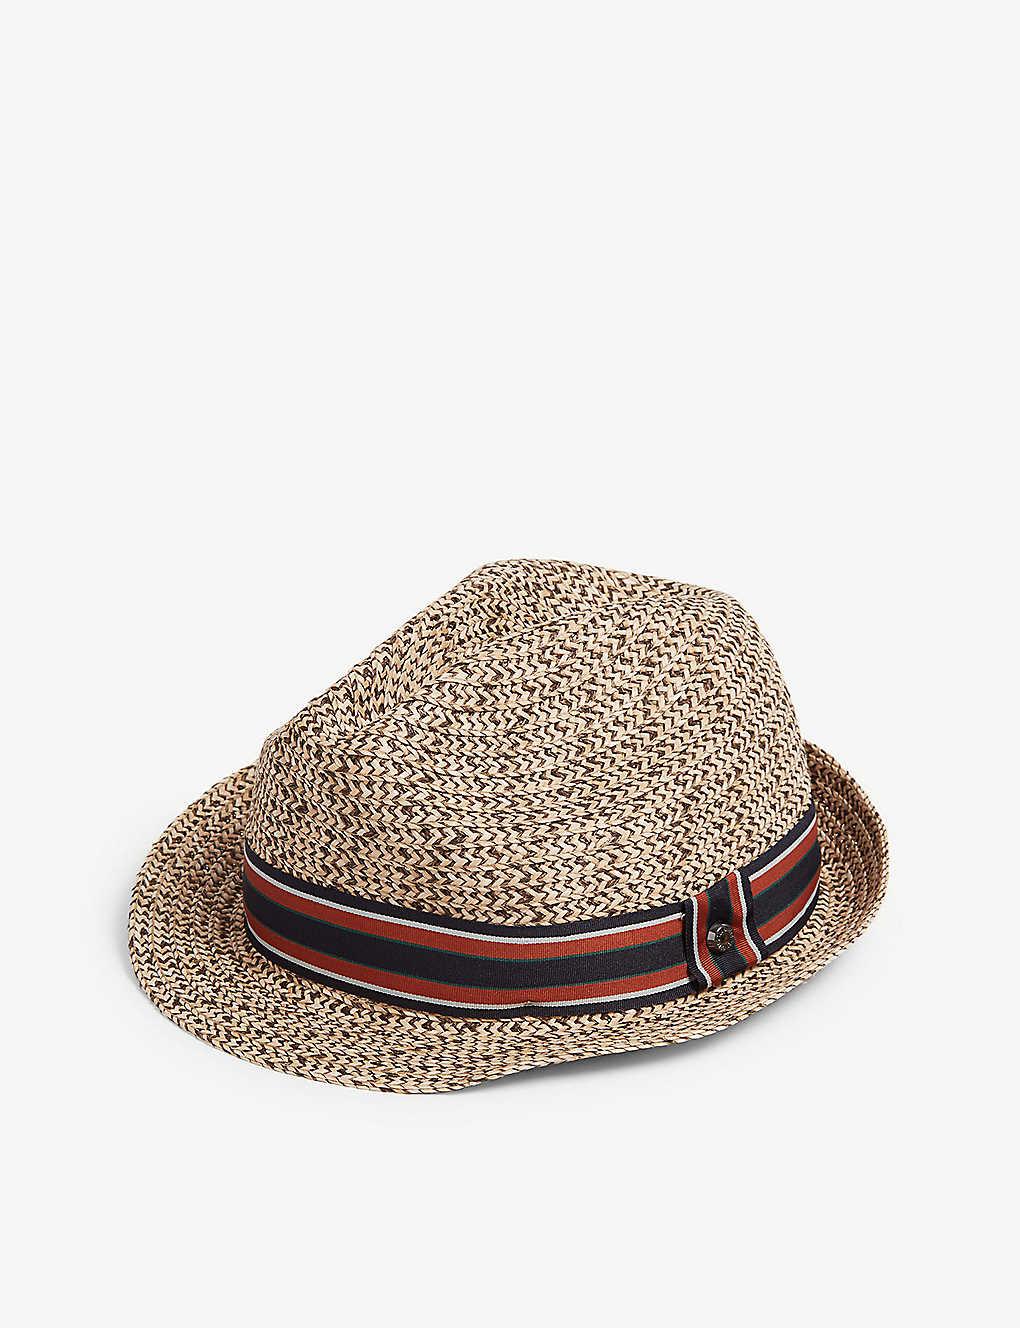 a85eb0e60 Syrup straw hat